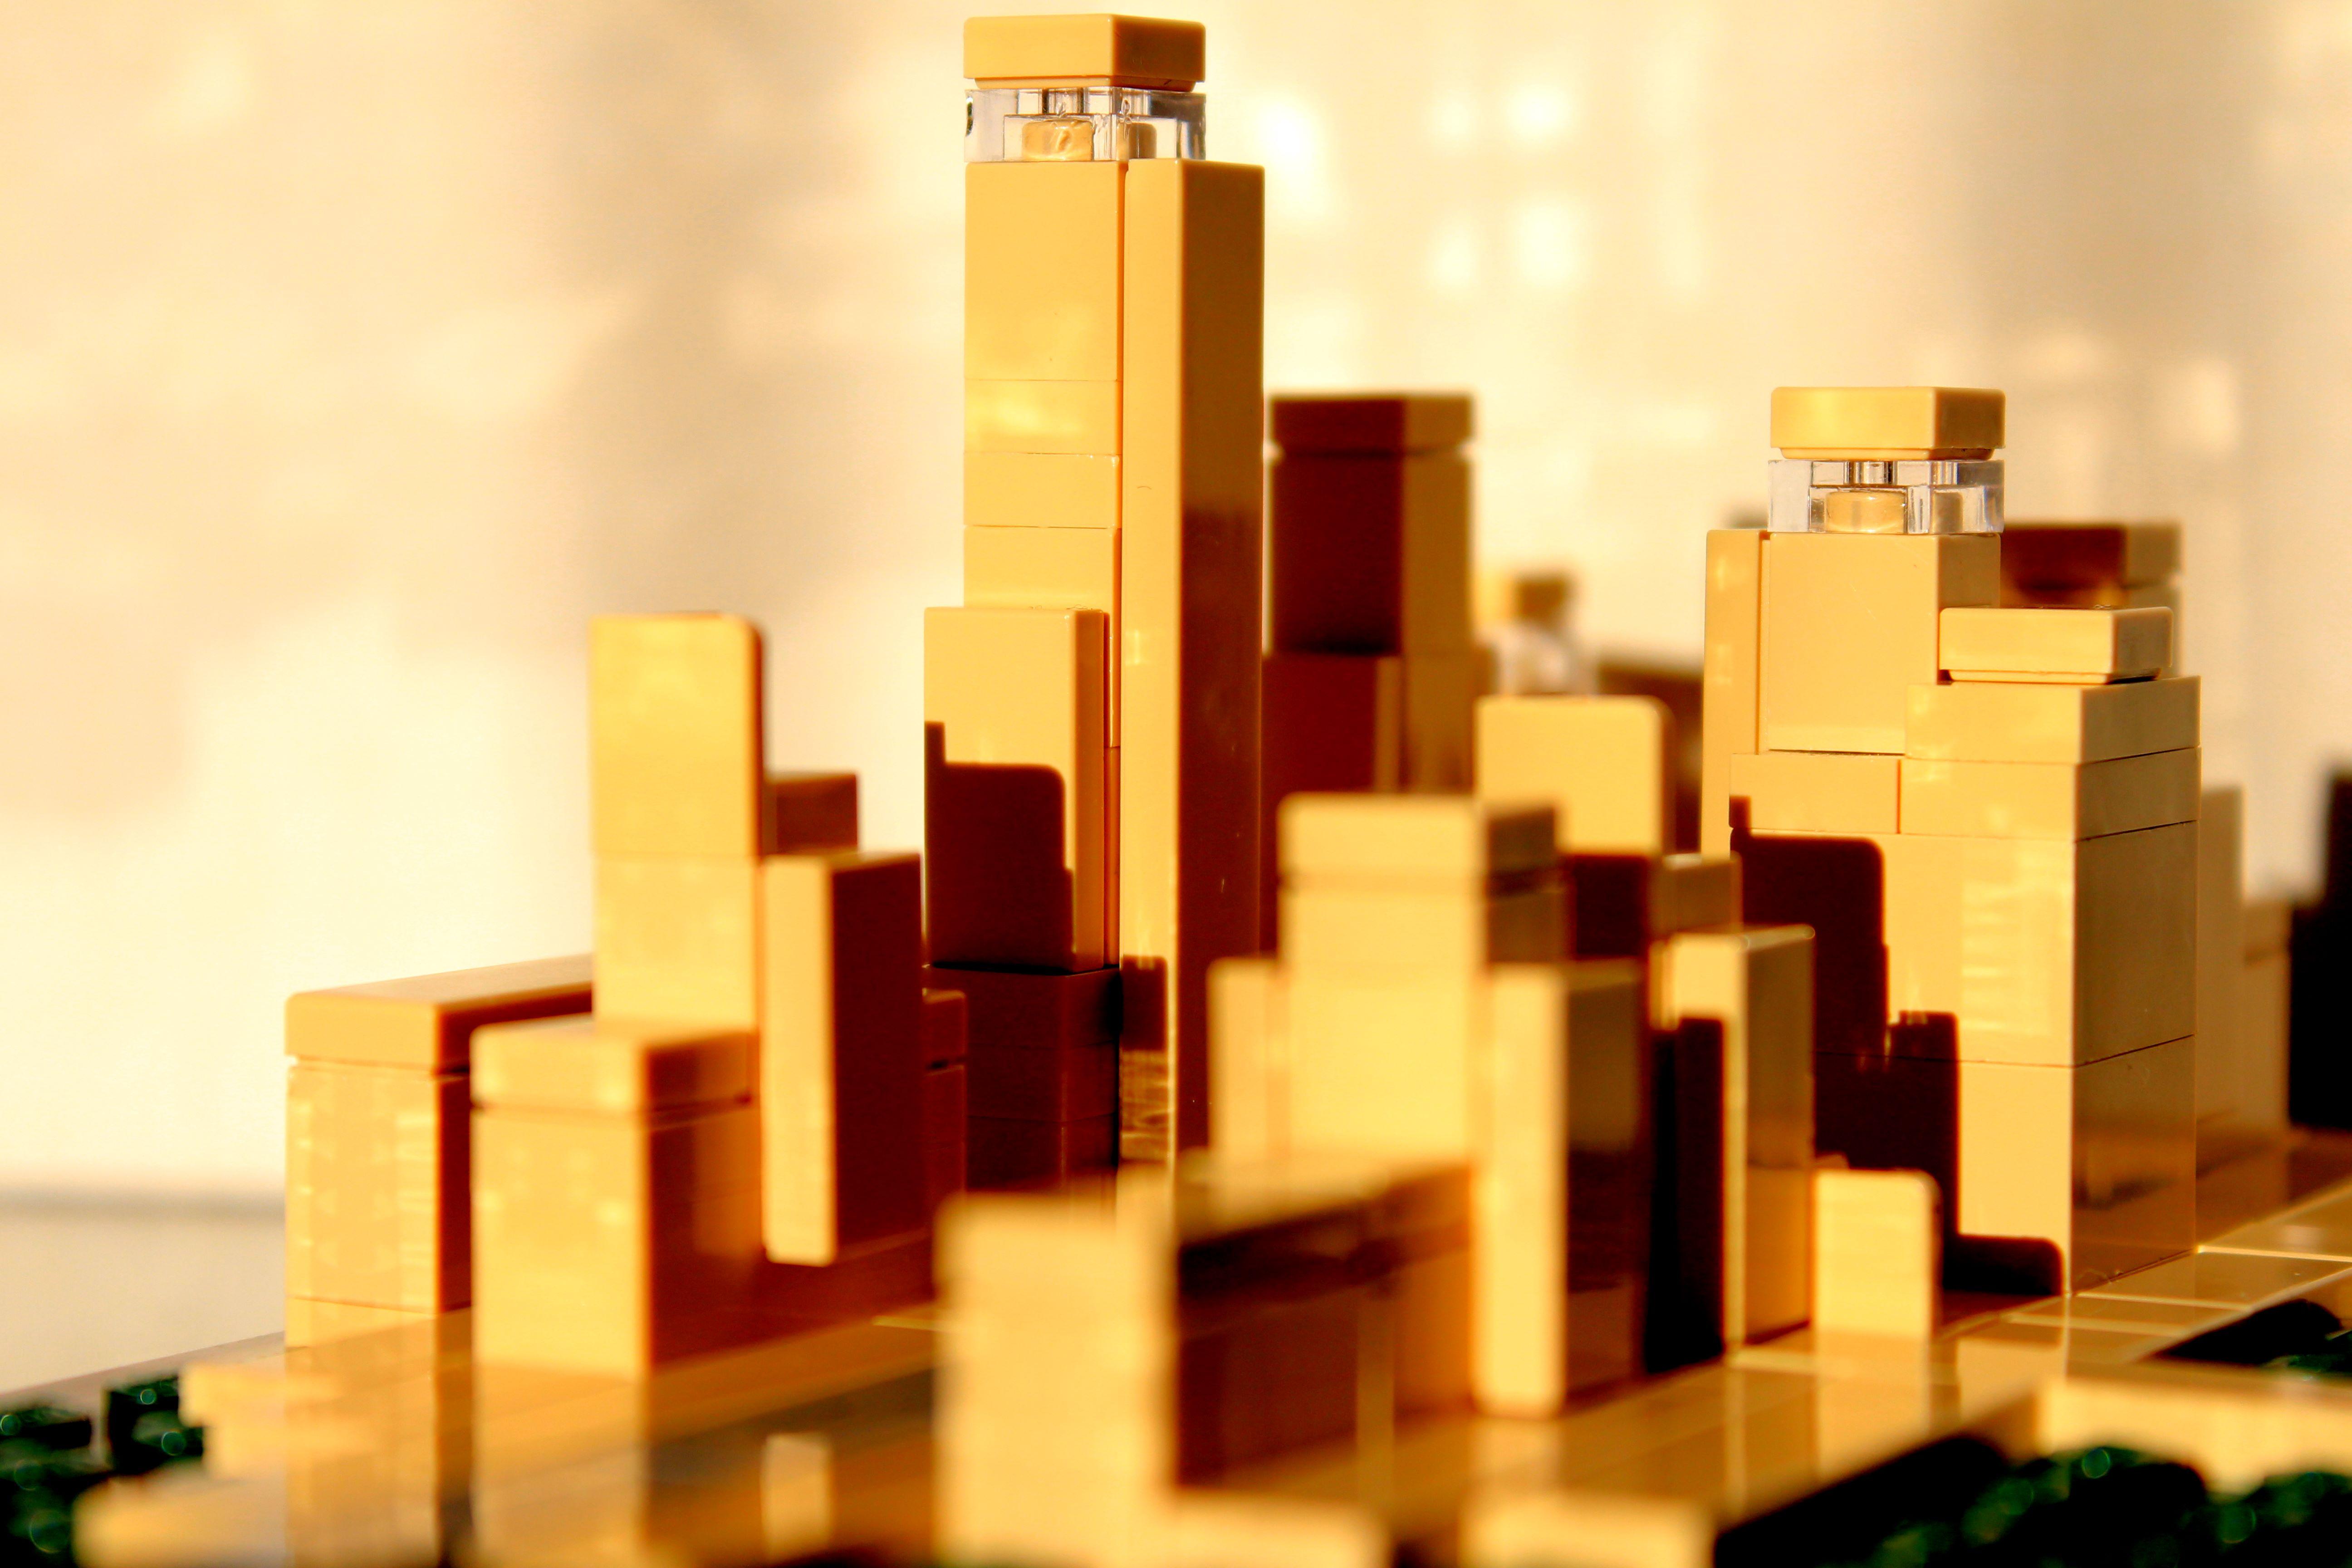 LEGO Skyline Scaping -- 3